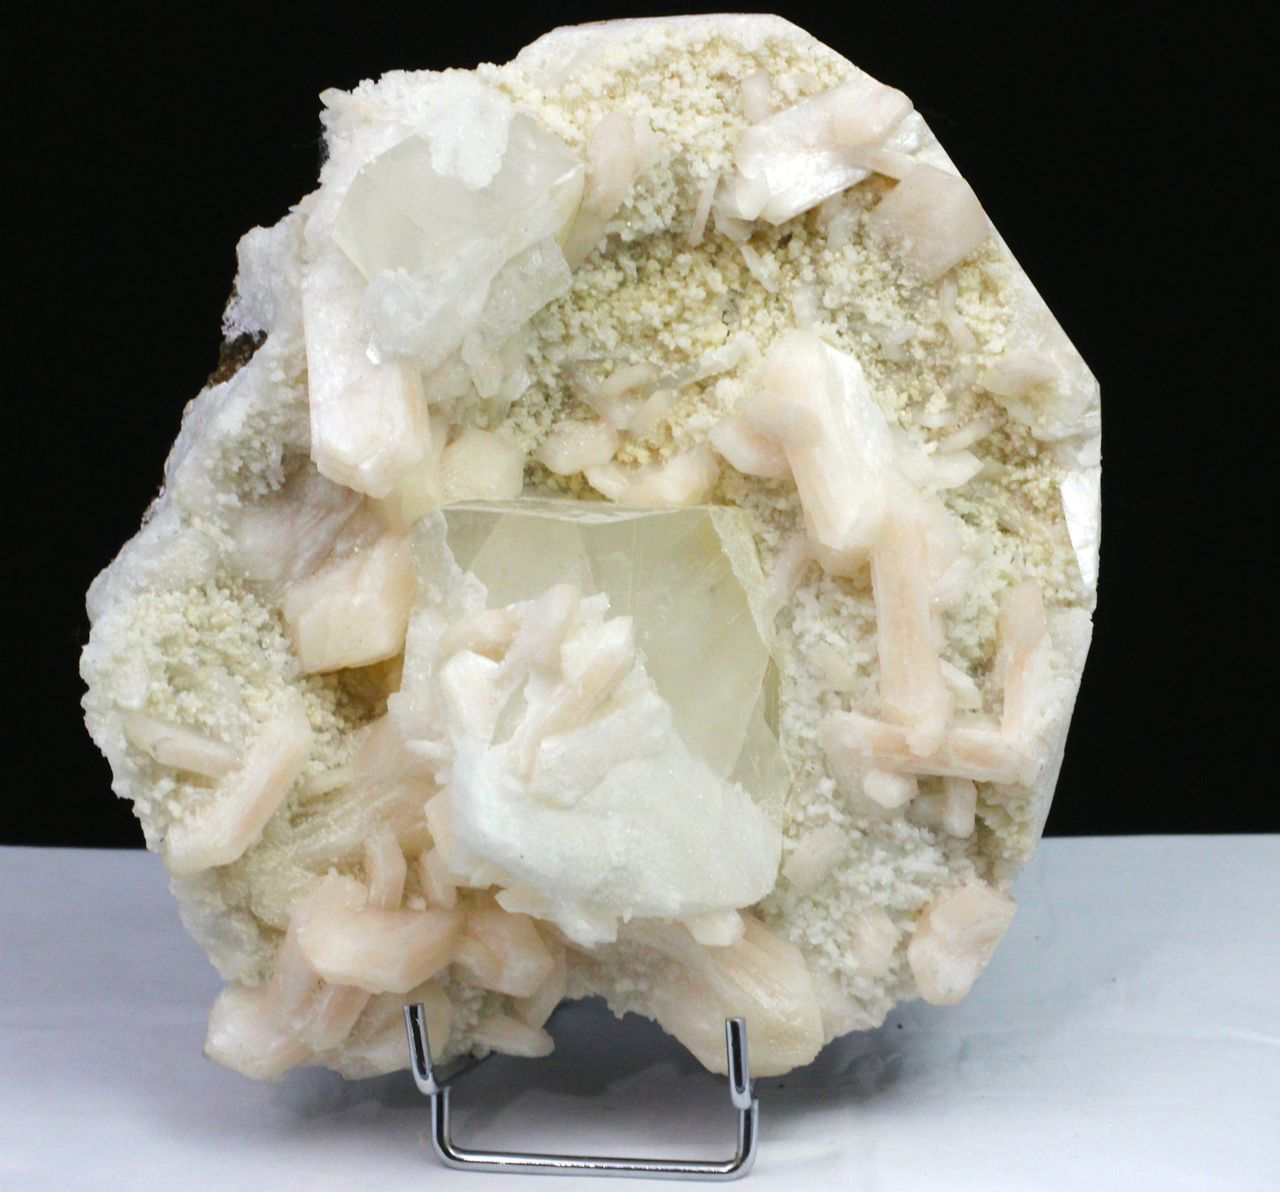 Calcite and stilbite